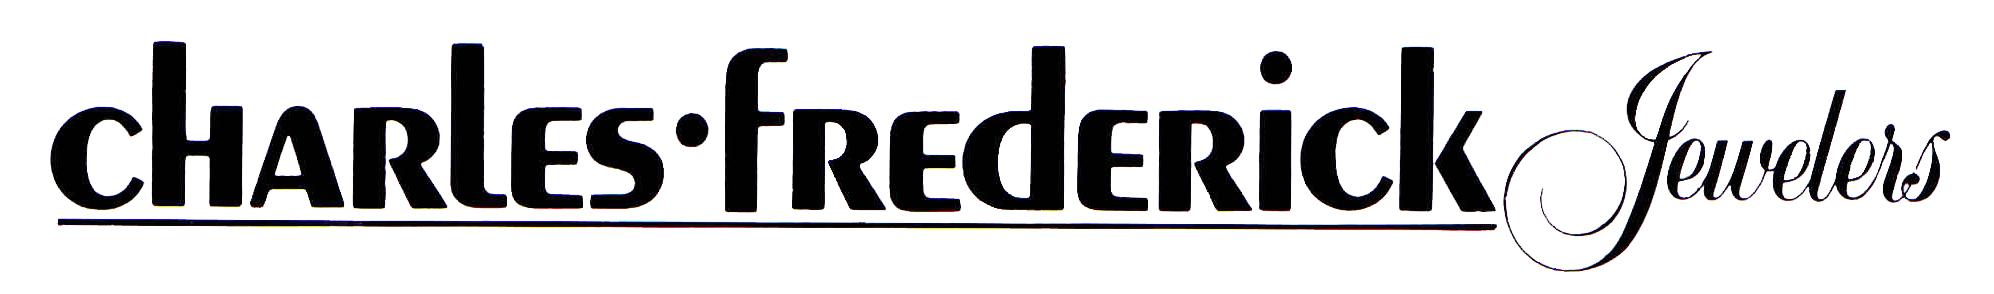 Charles Frederick Jewelers logo